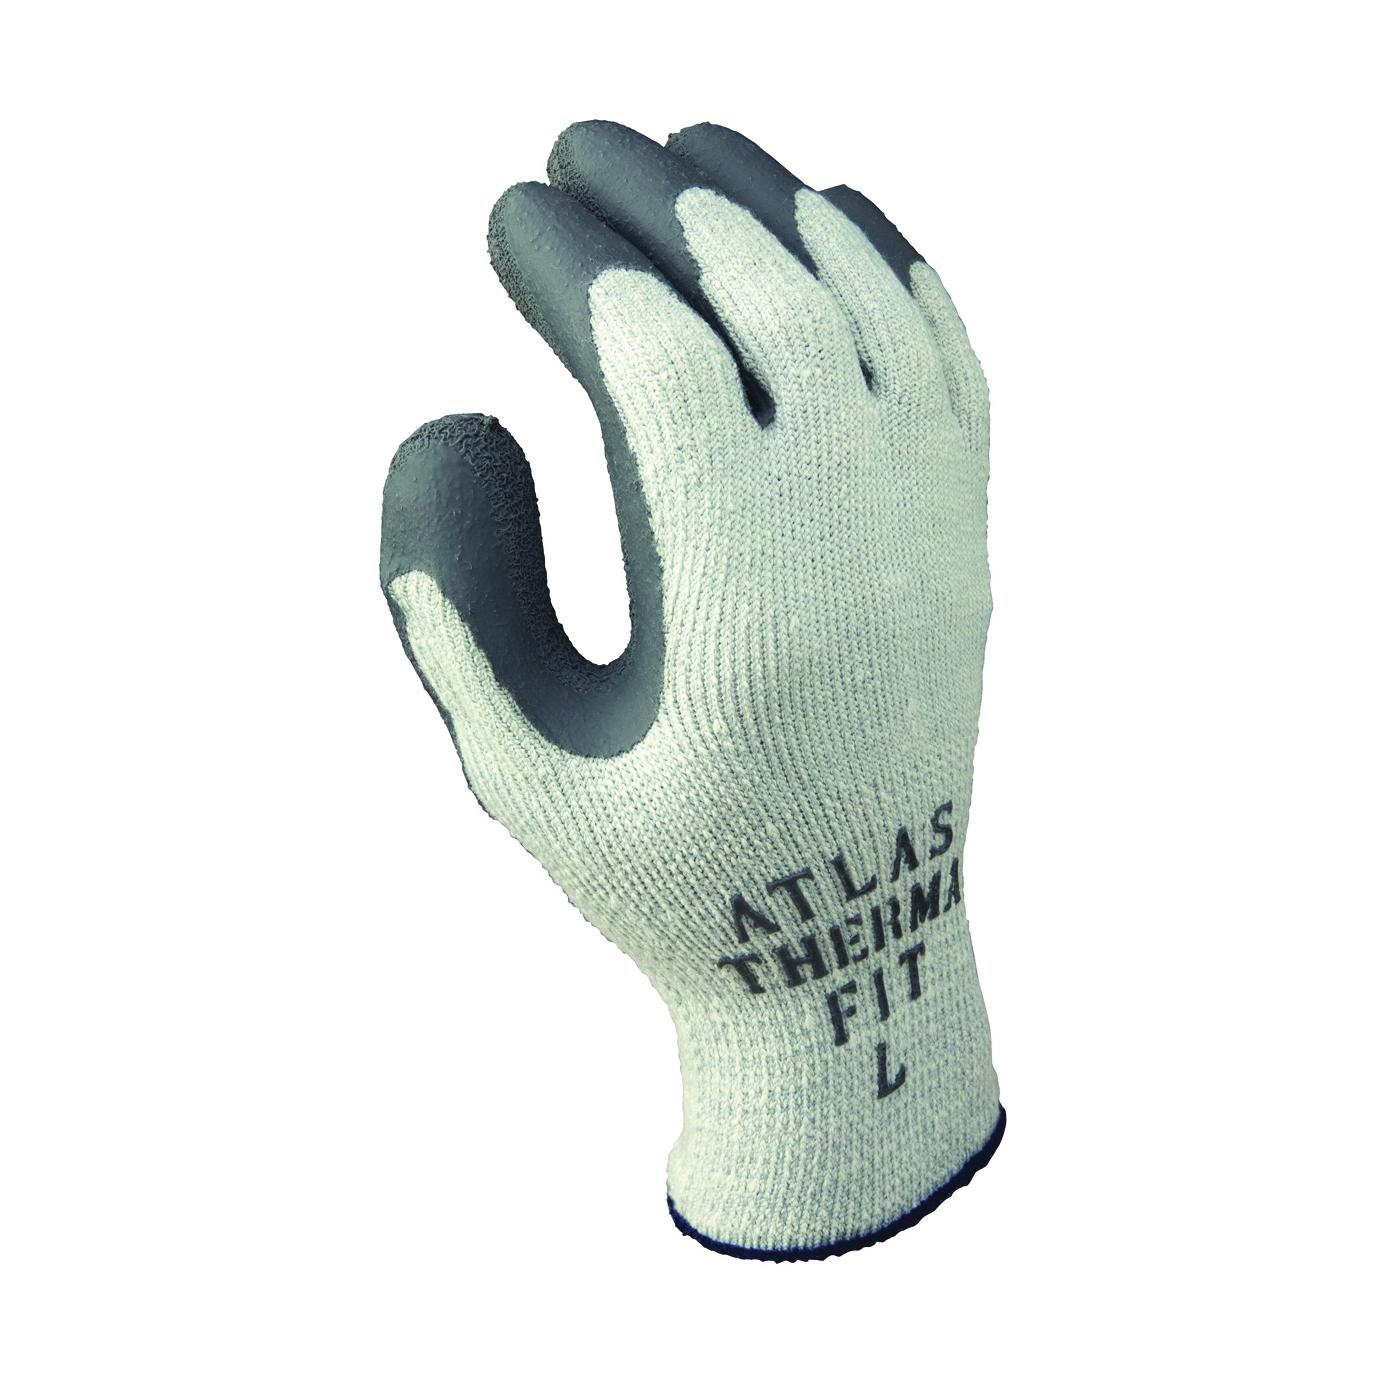 Picture of ATLAS ThermaFit 451L-09.RT Ergonomic Work Gloves, Unisex, L, 9 in L, Knit Wrist Cuff, Rubber, Dark Gray